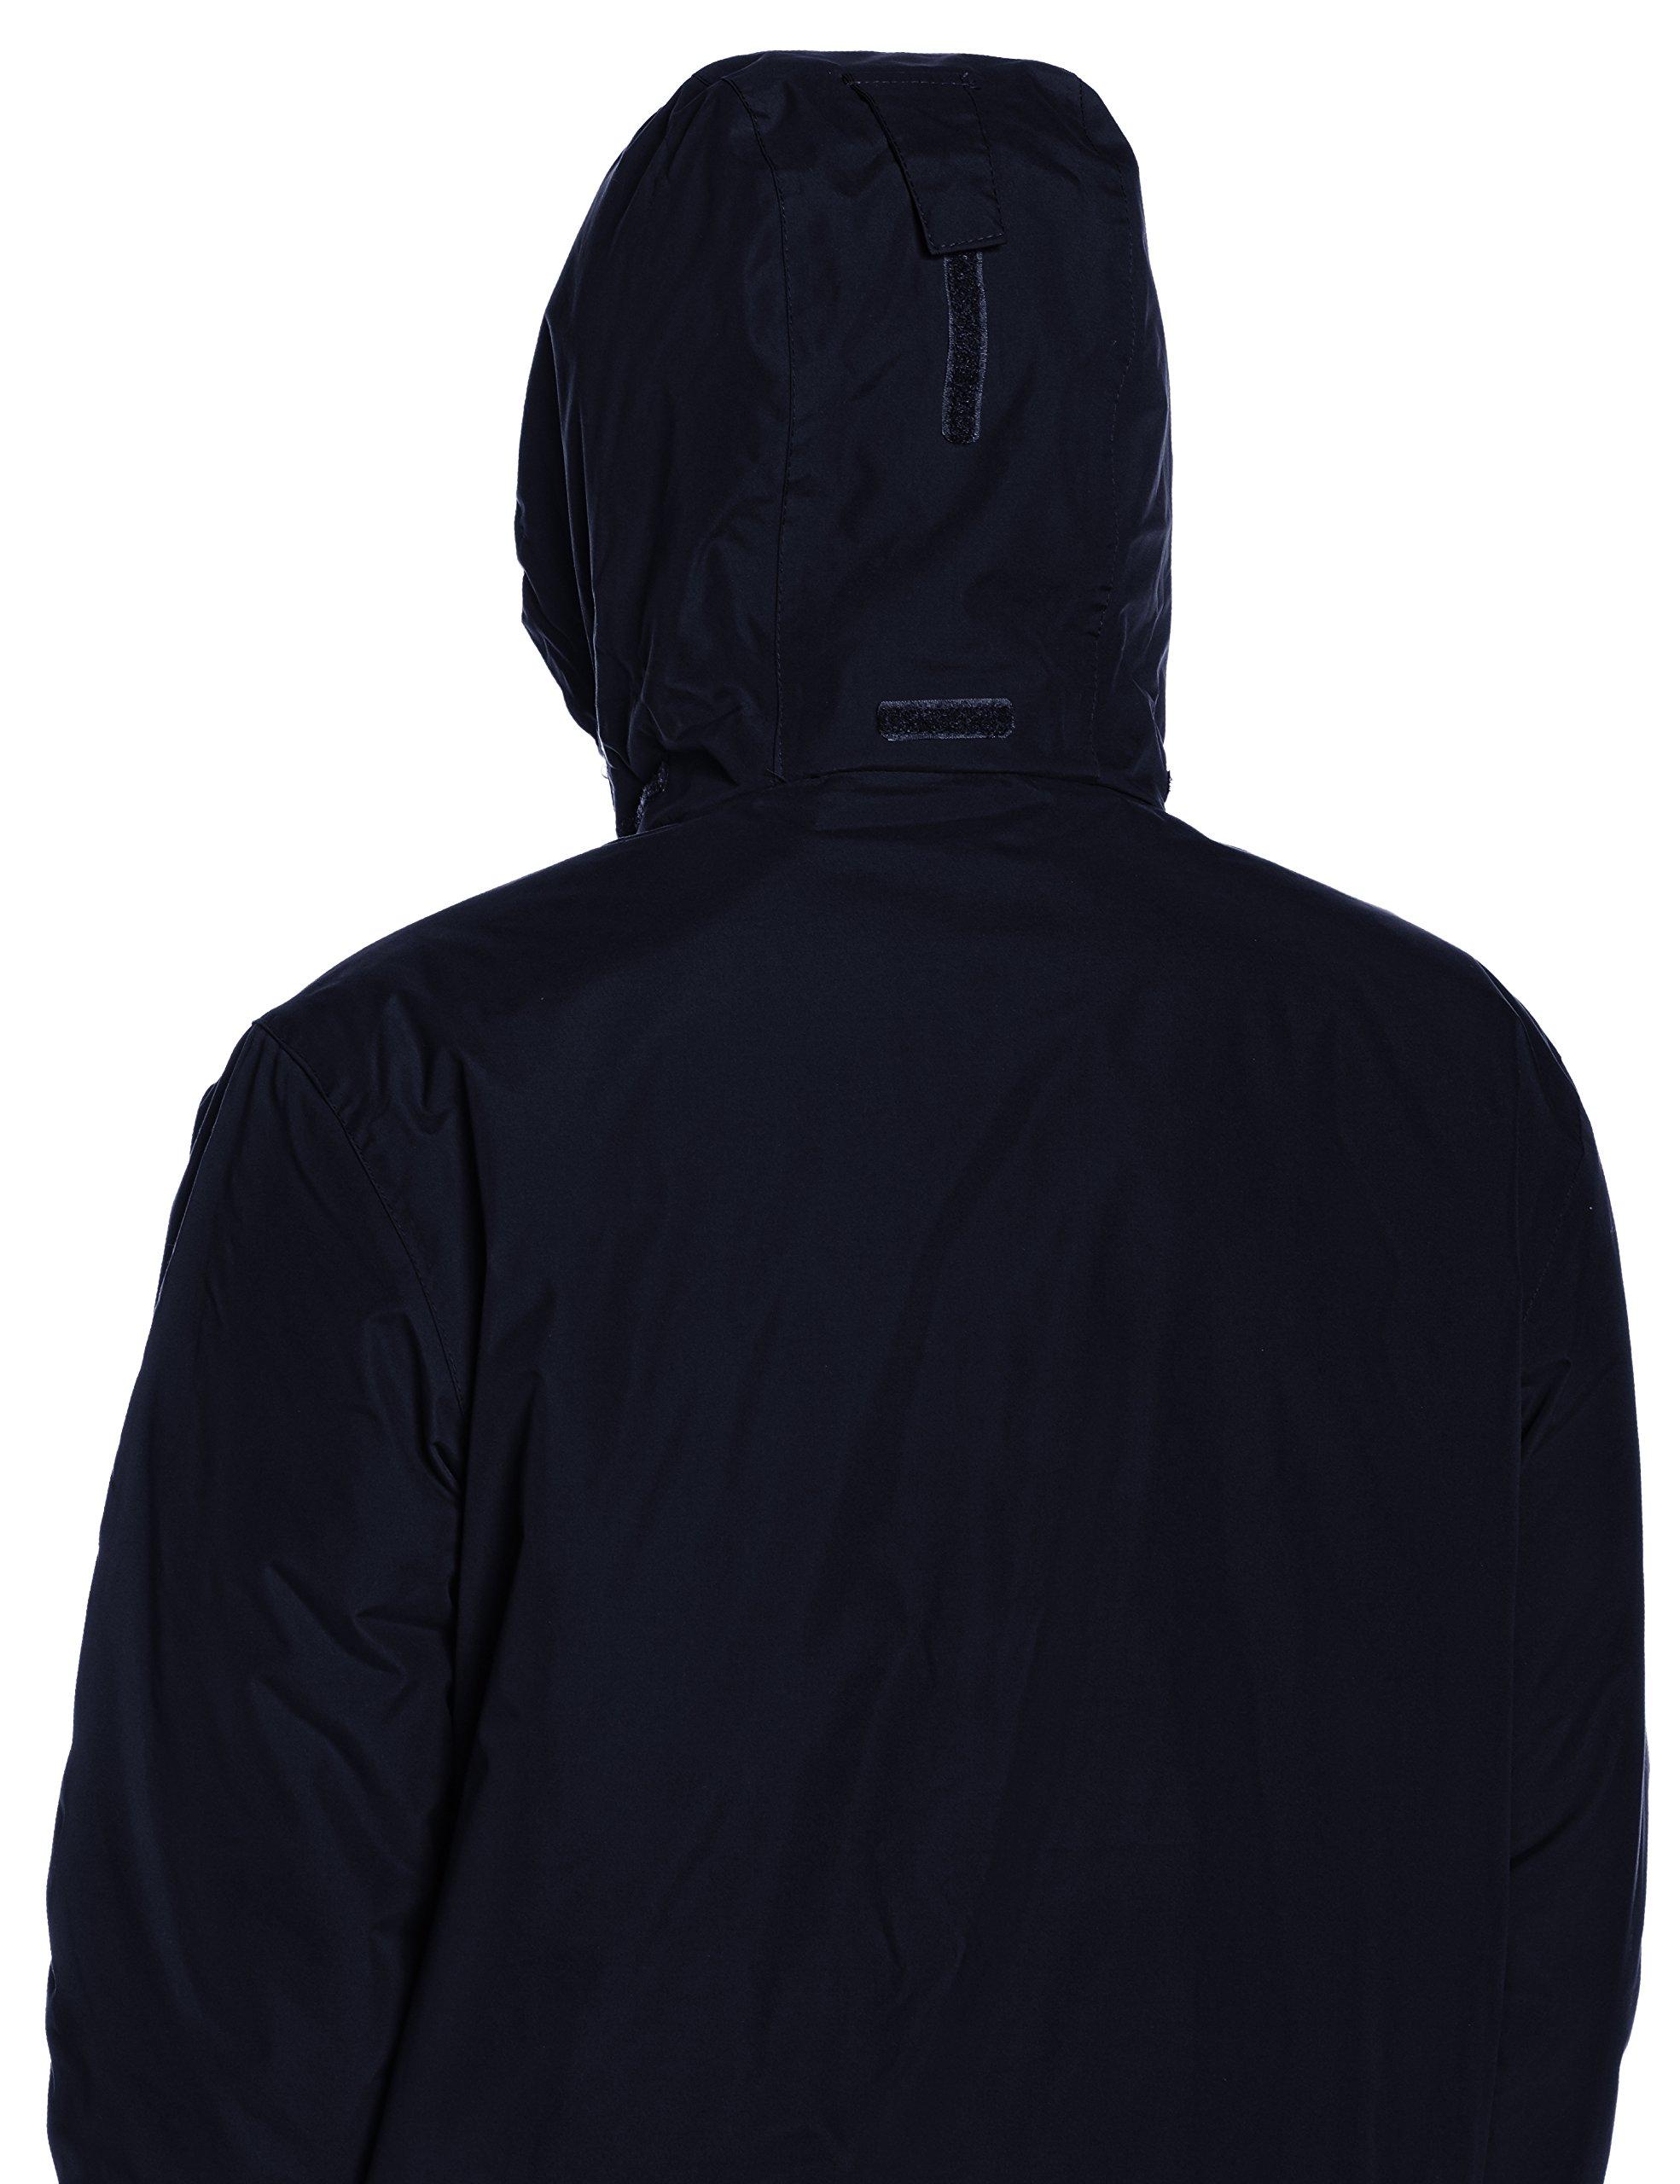 81HBmiXUWOL - Regatta Men's Thornridge Waterproof Jacket